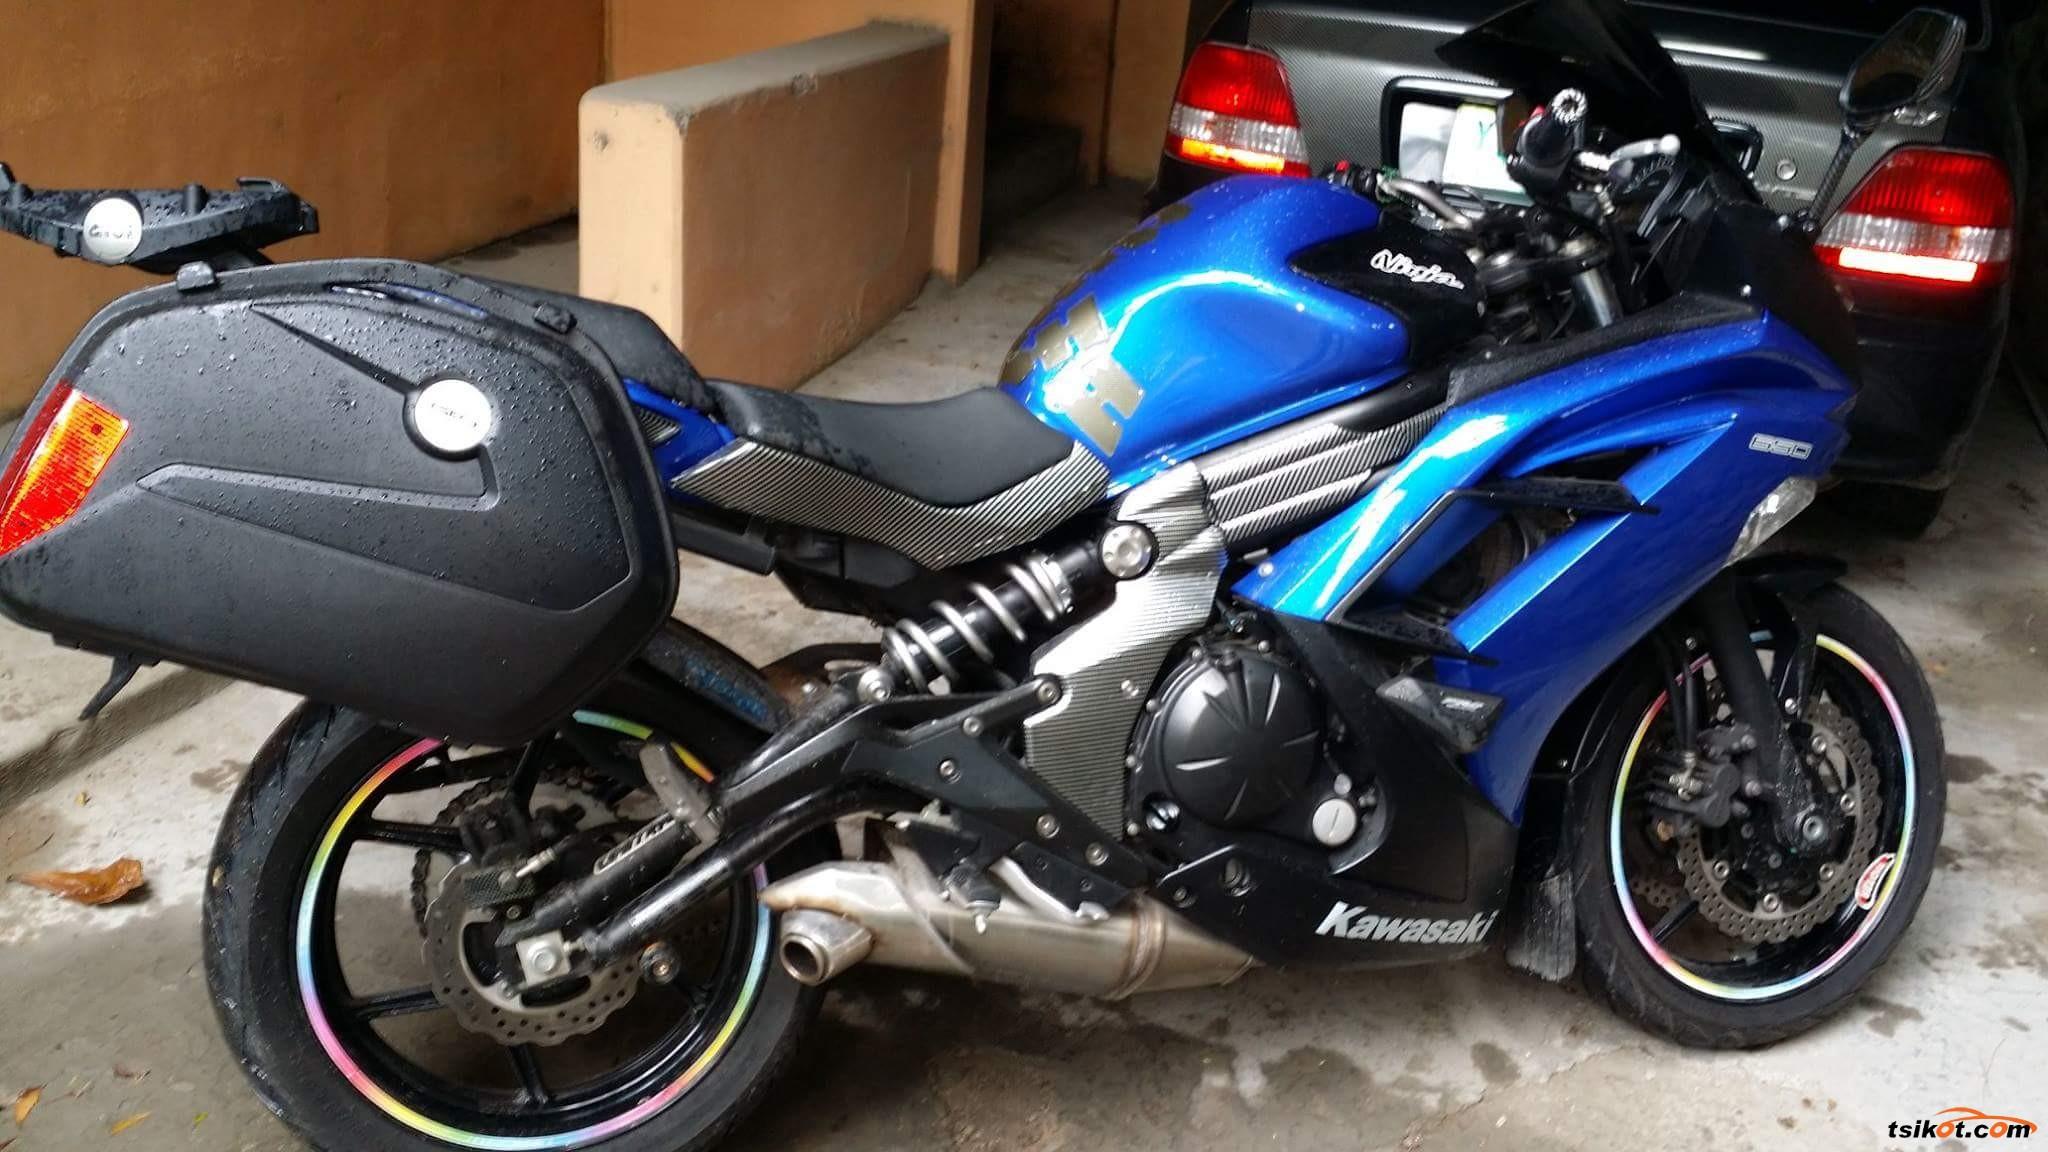 Kawasaki Er-6F 2012 - Motorbike for Sale Central Visayas